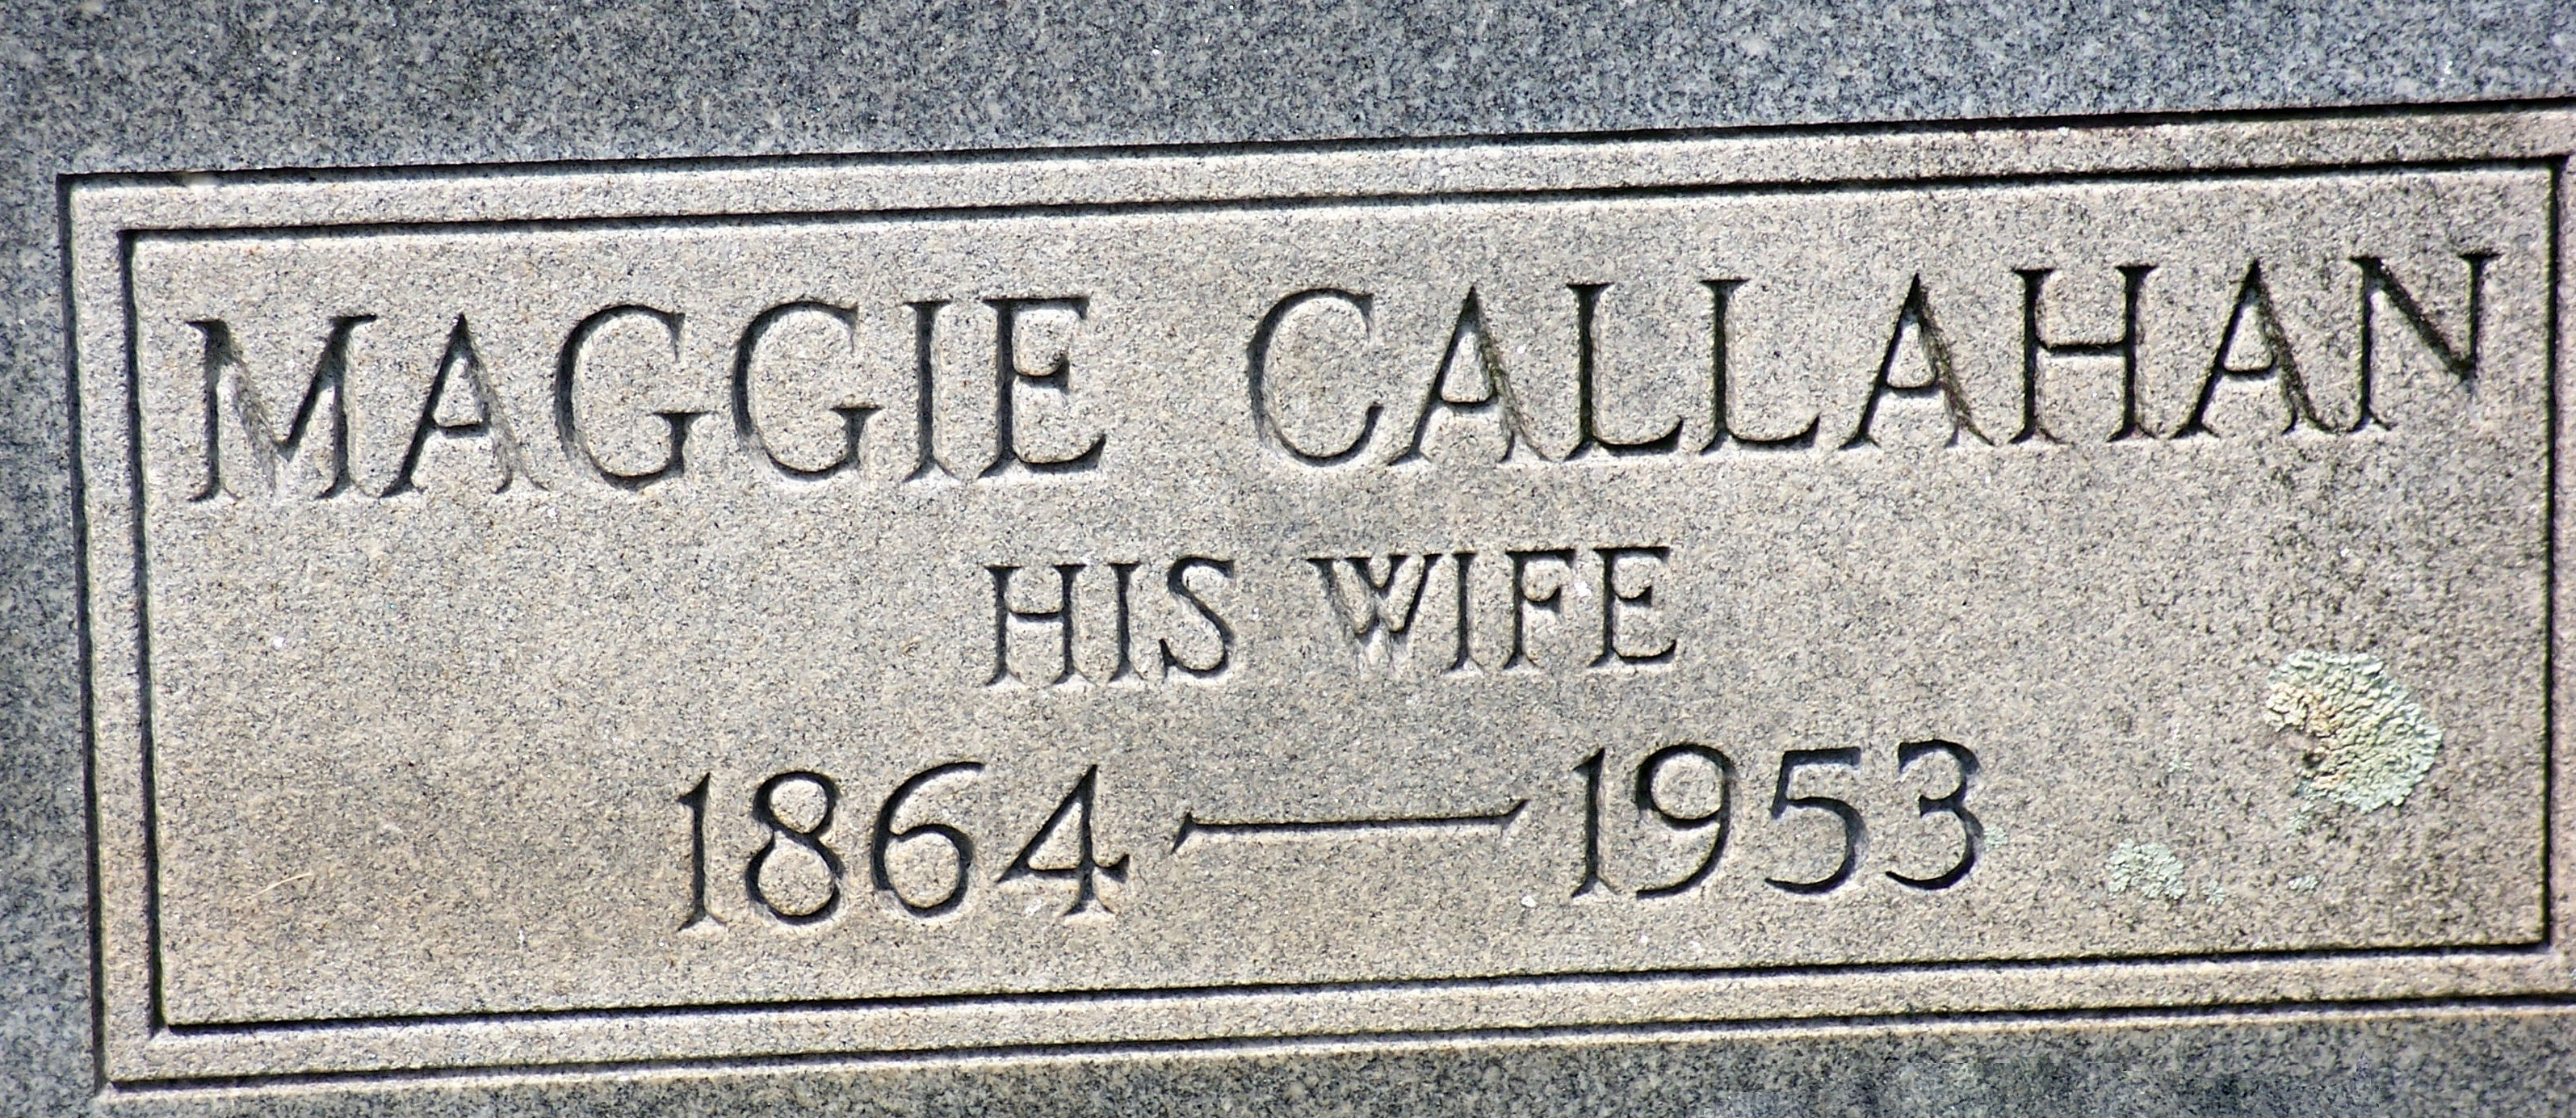 "Margaret Cordelia ""Maggie"" Callahan"